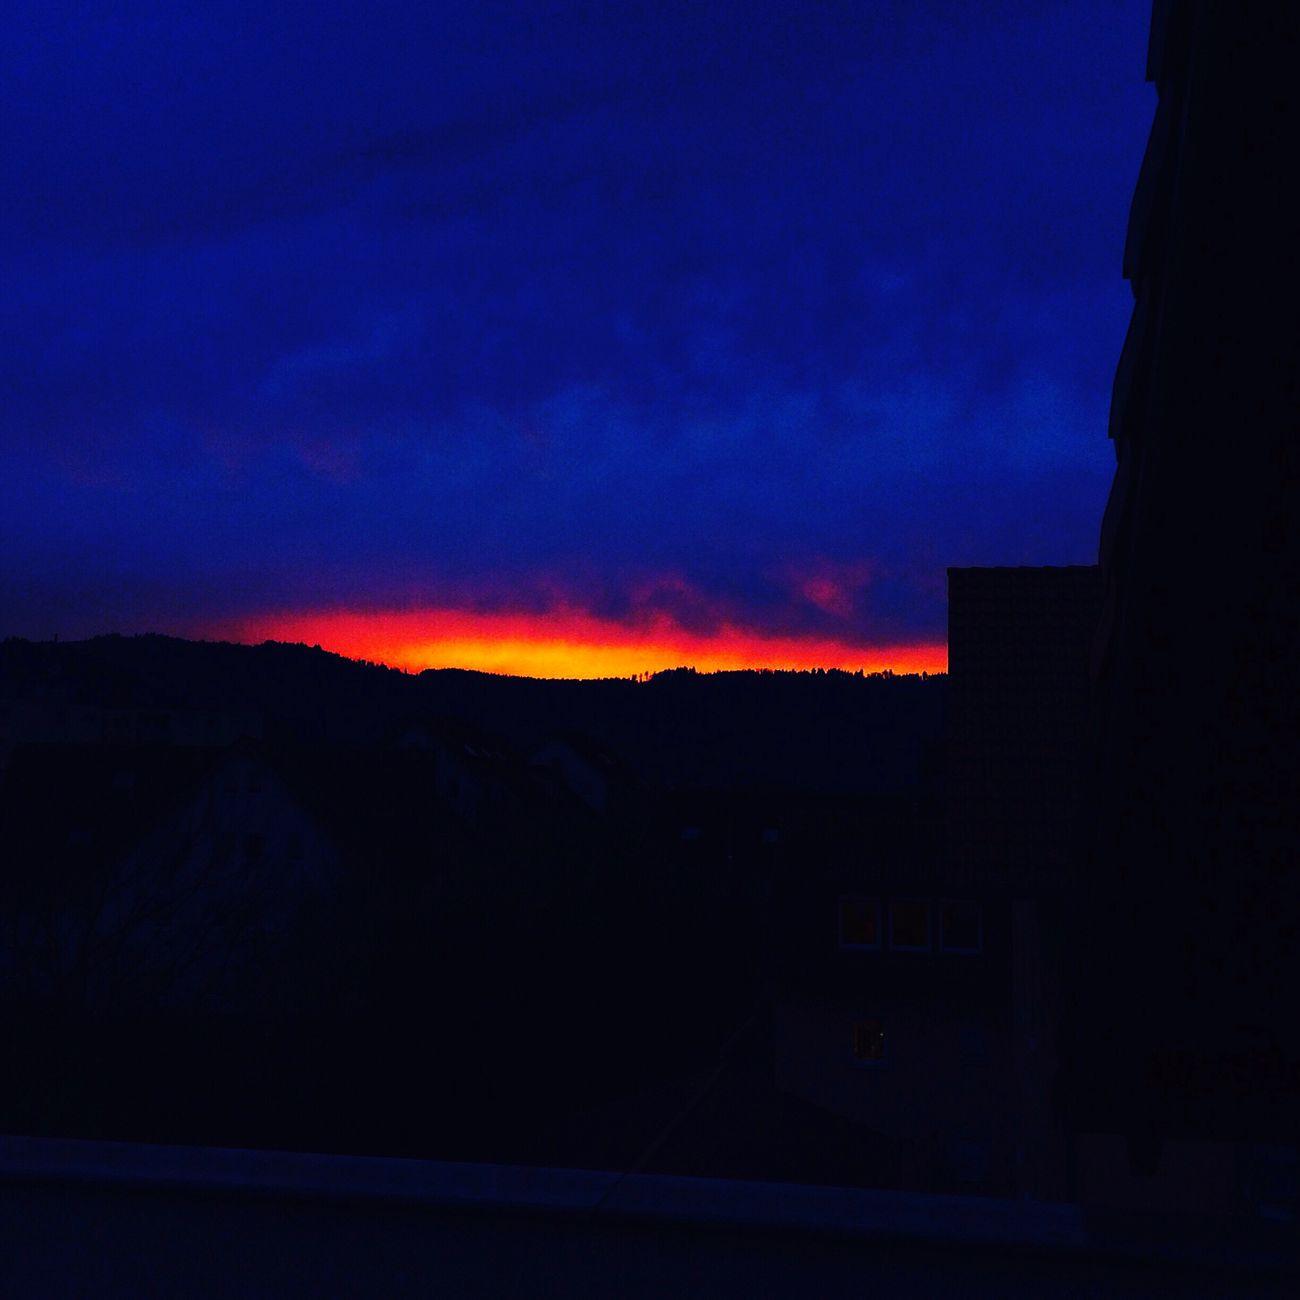 Sun Sunrise Red Orange Blue Sky Amazing First Eyeem Photo